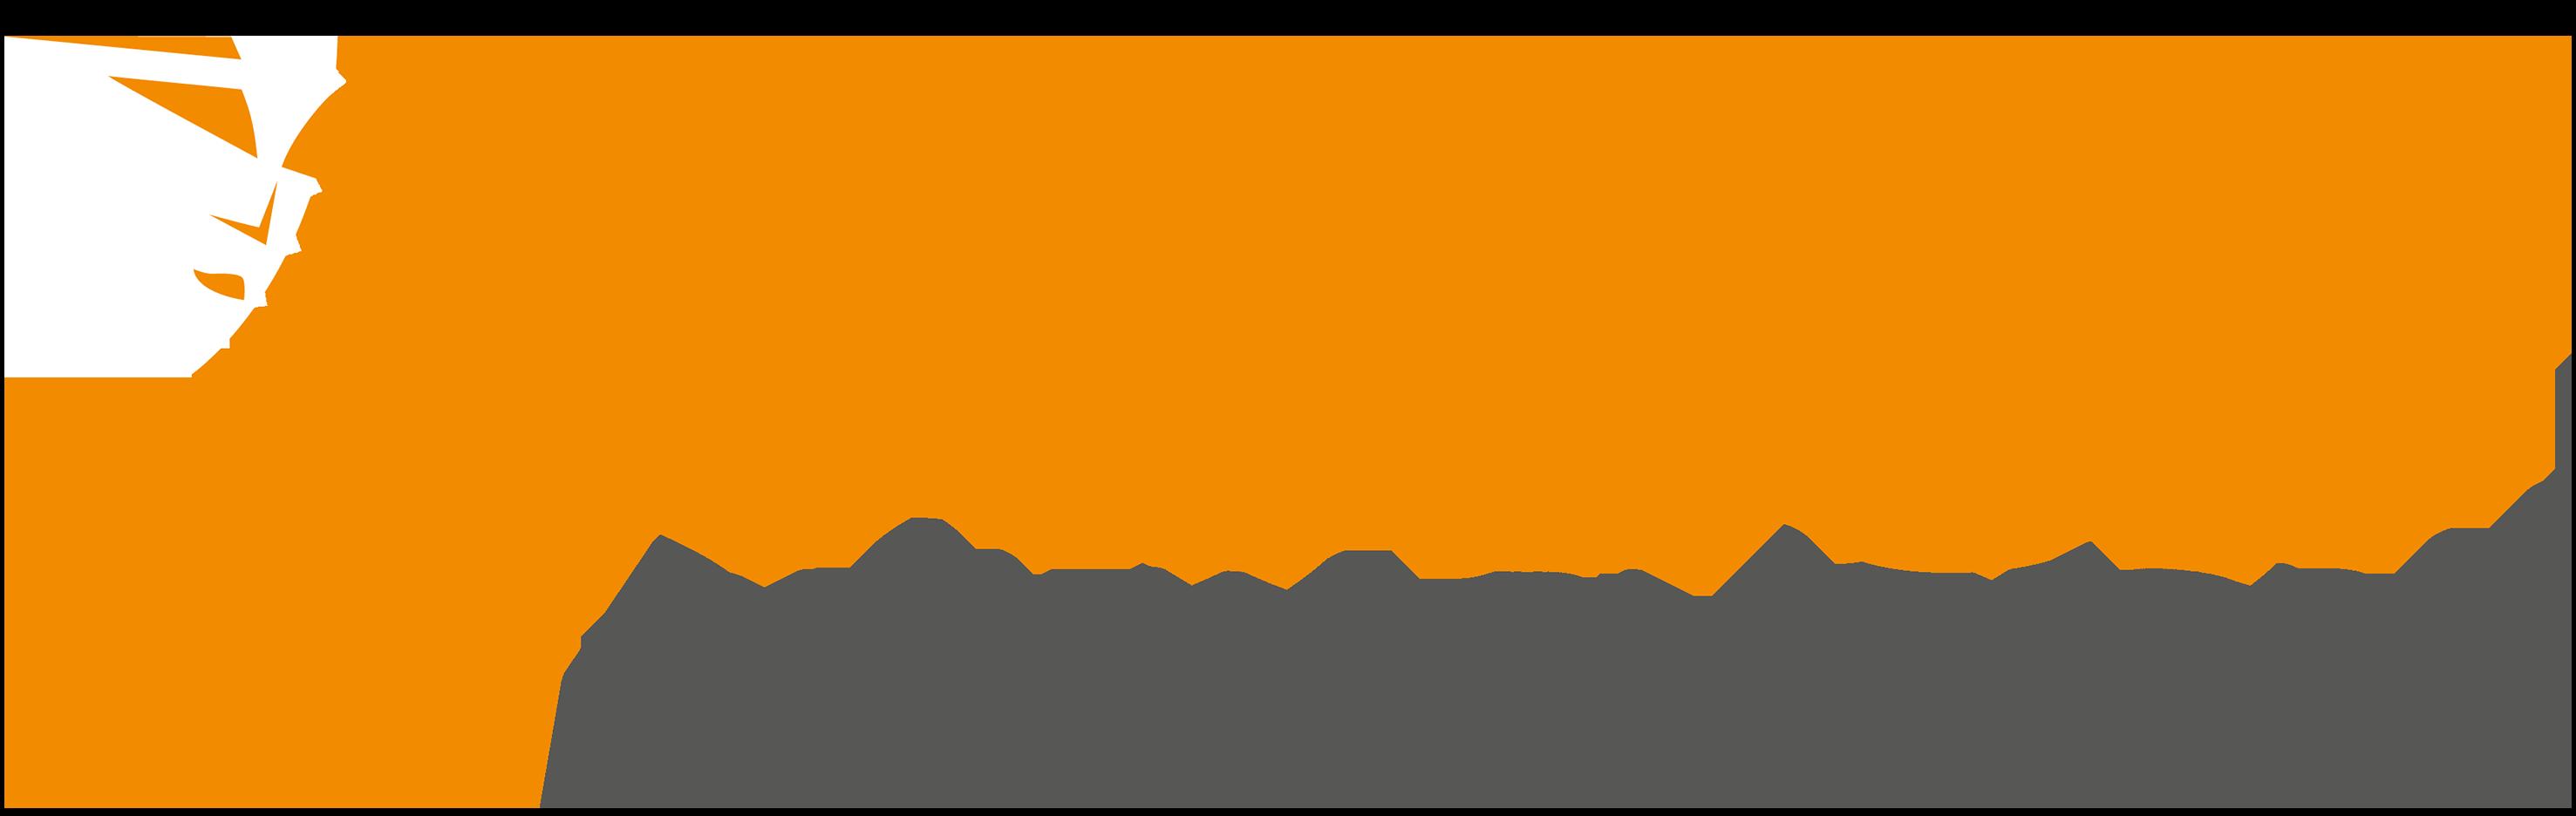 Astrea Digital Platform